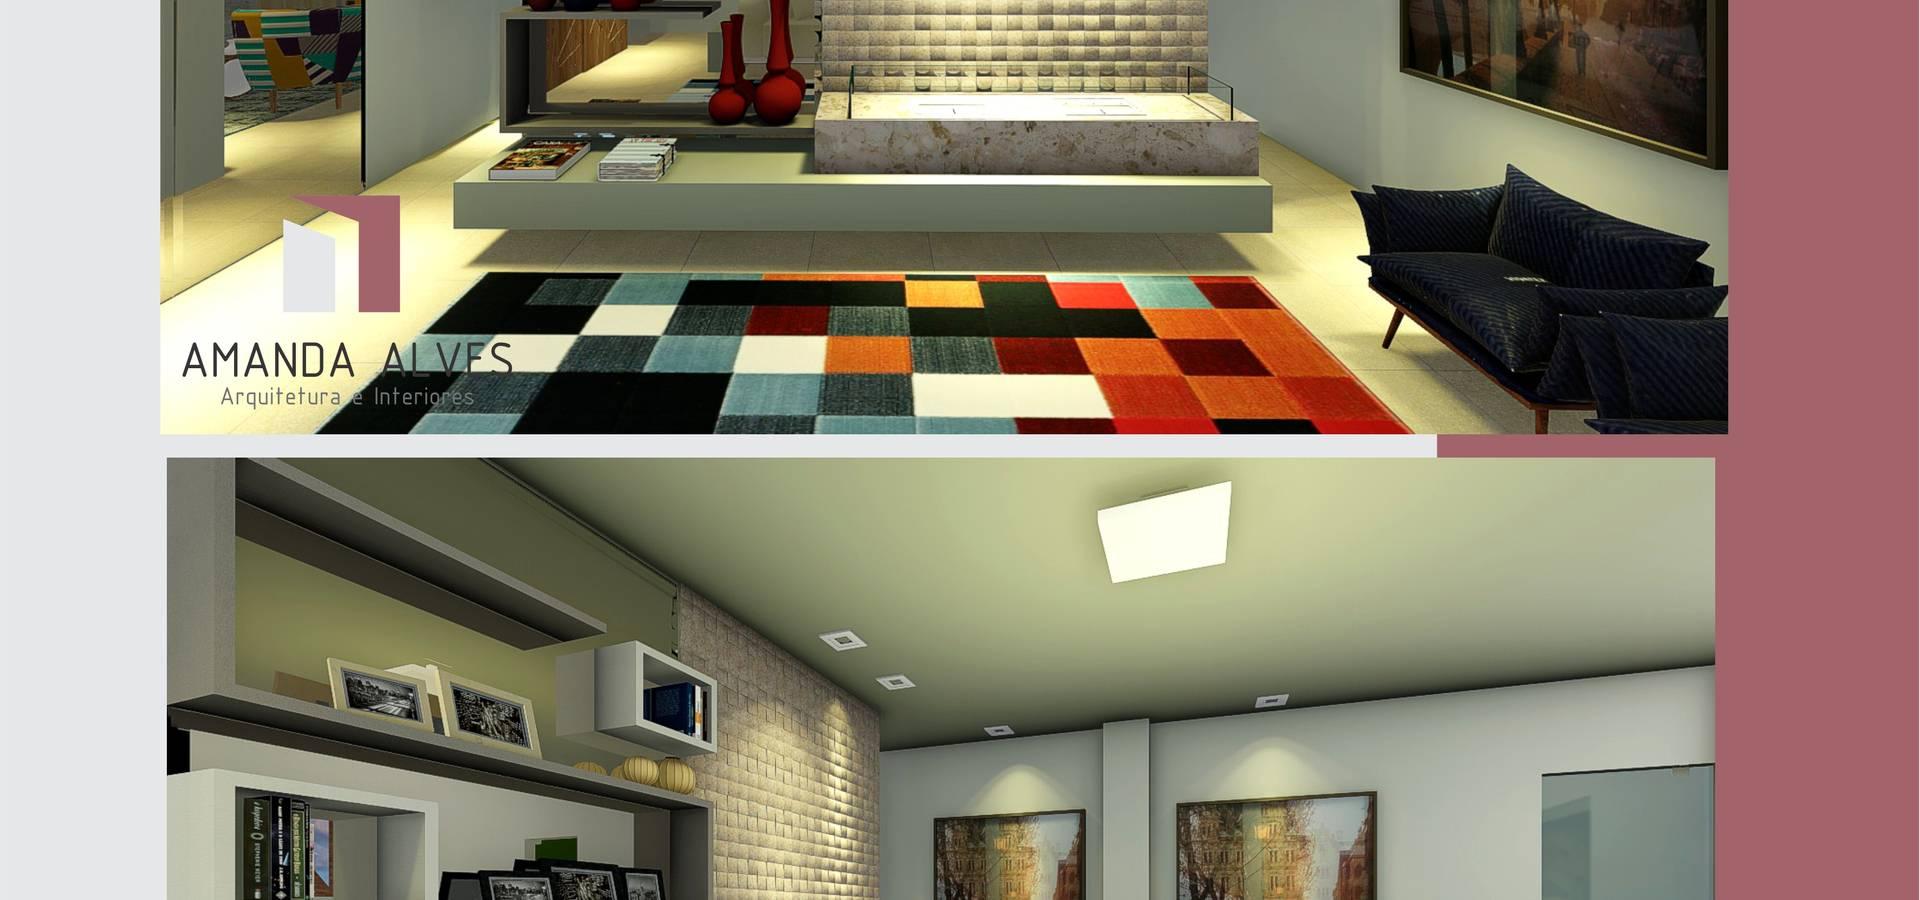 Amanda Alves Arquitetura e Interiores